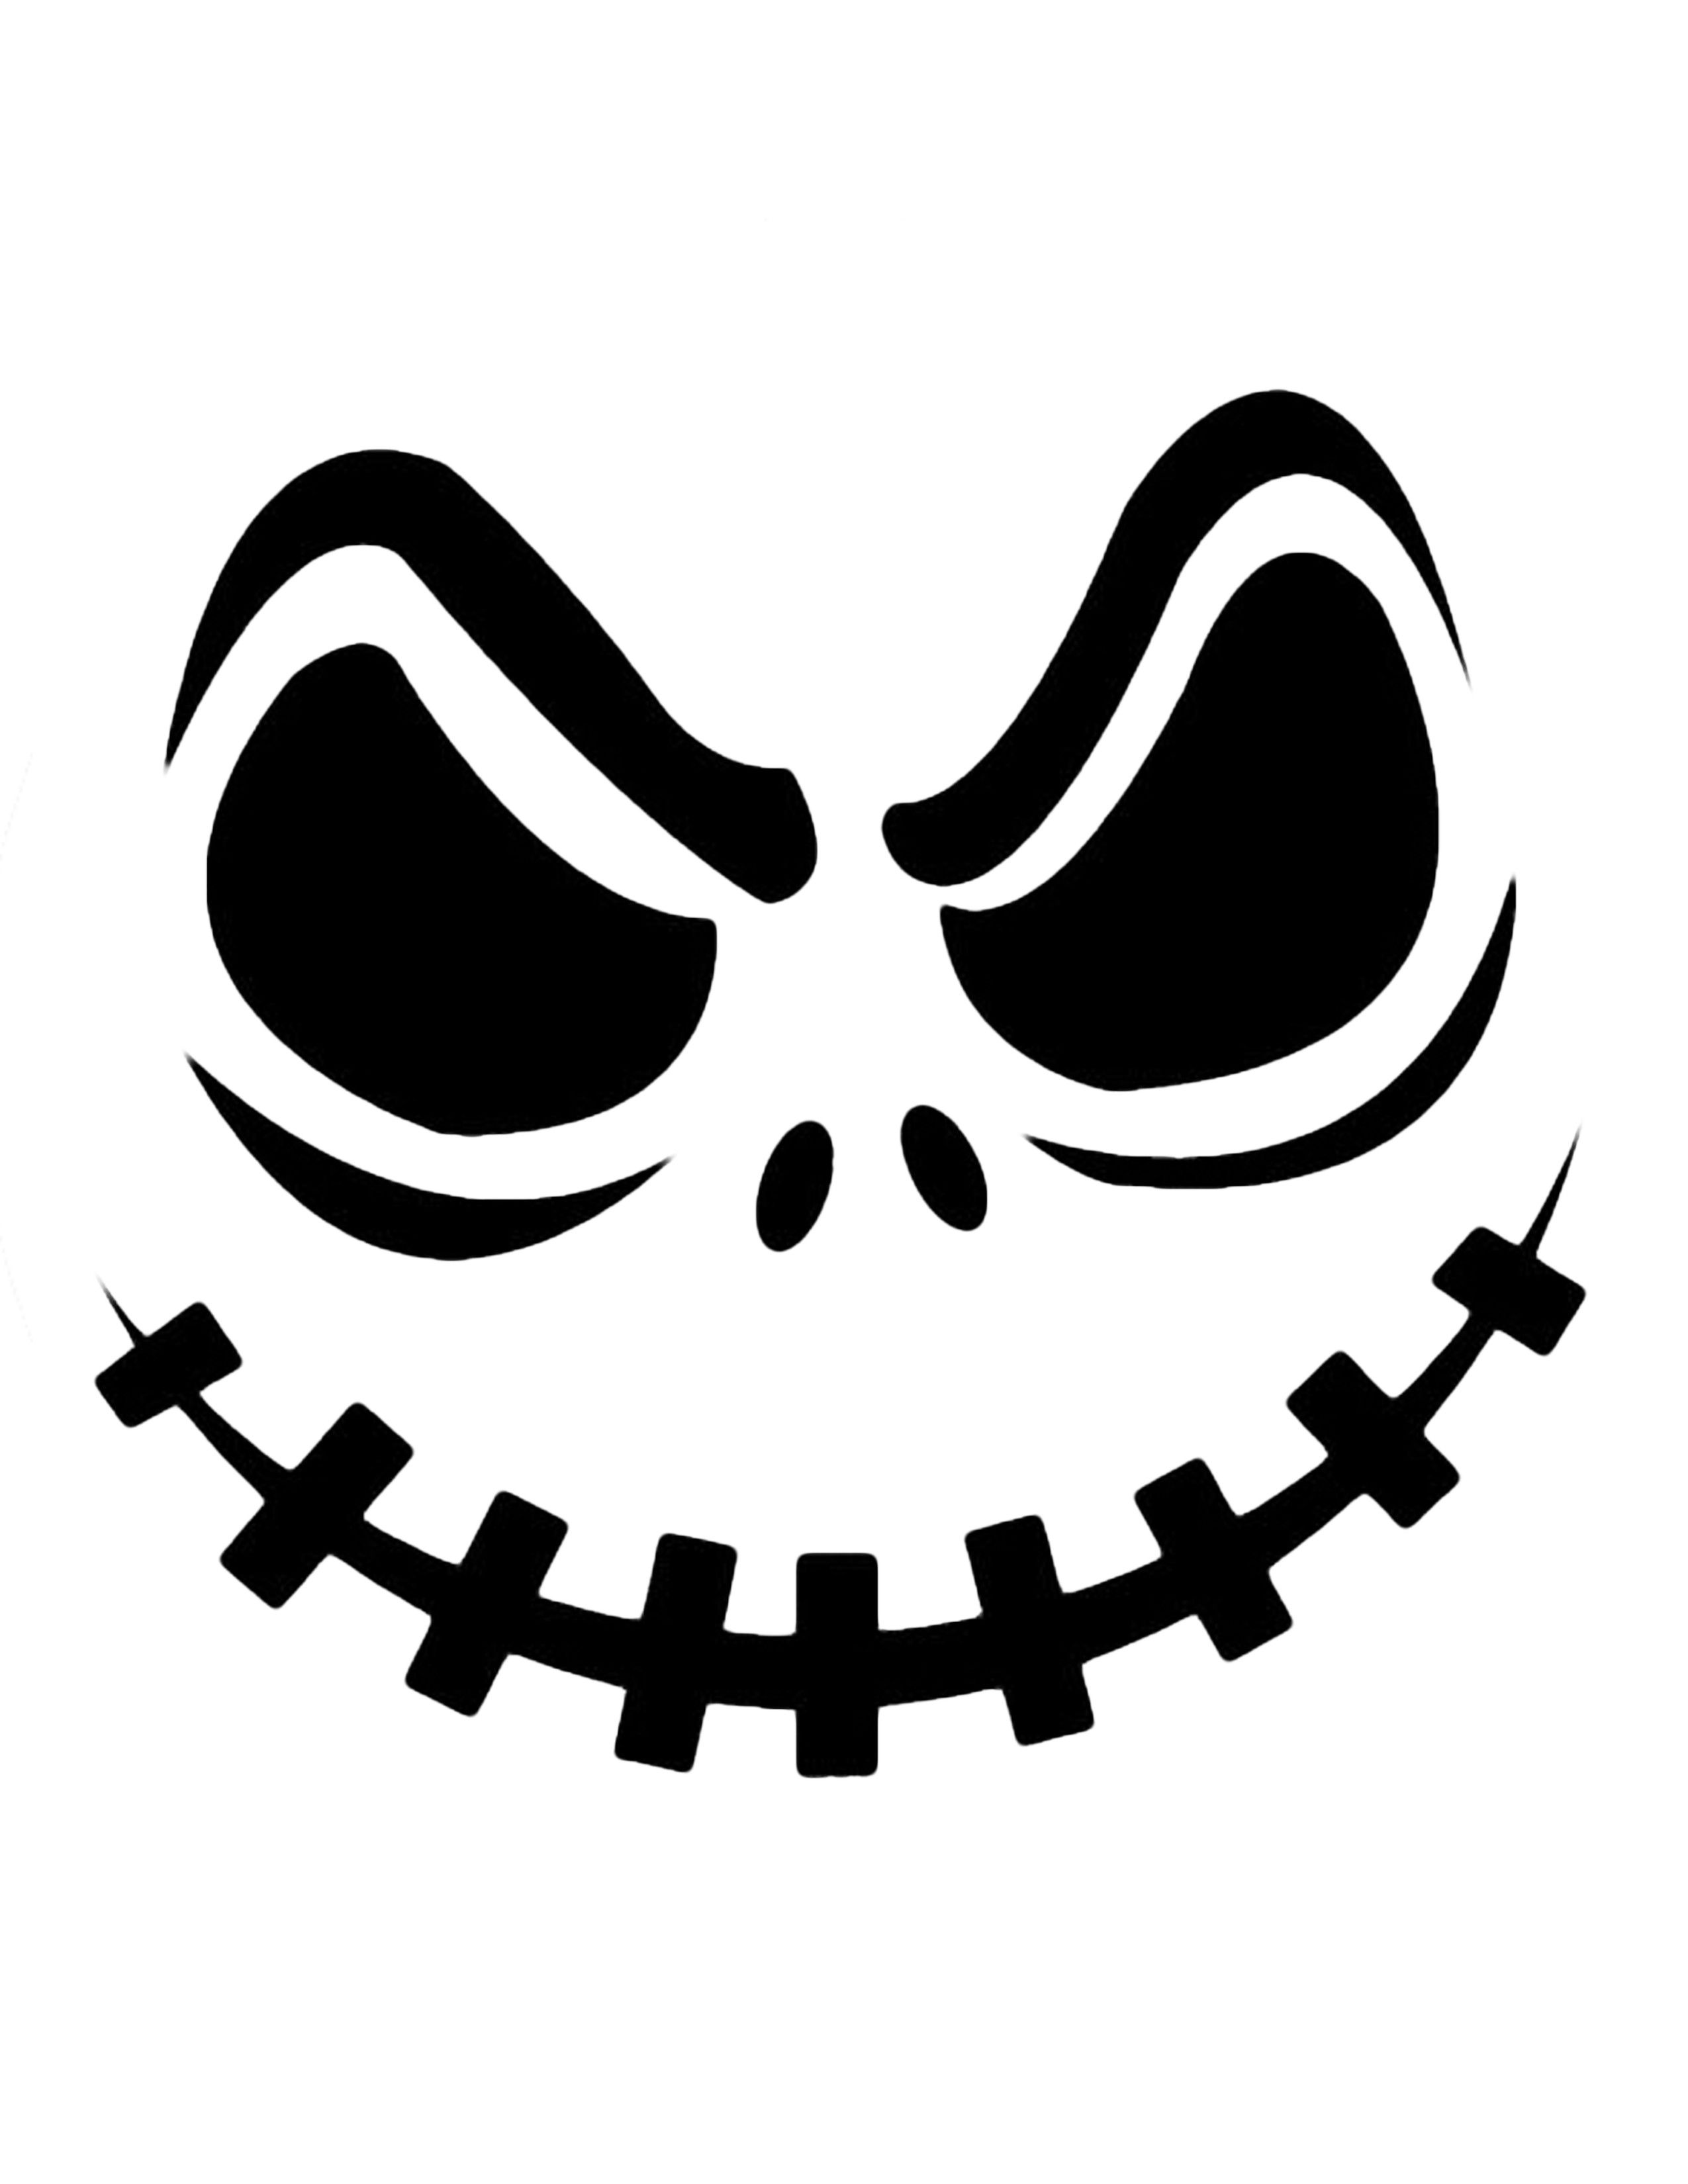 Pumpkin Carving Printable Templates | Halloween | Pinterest ...